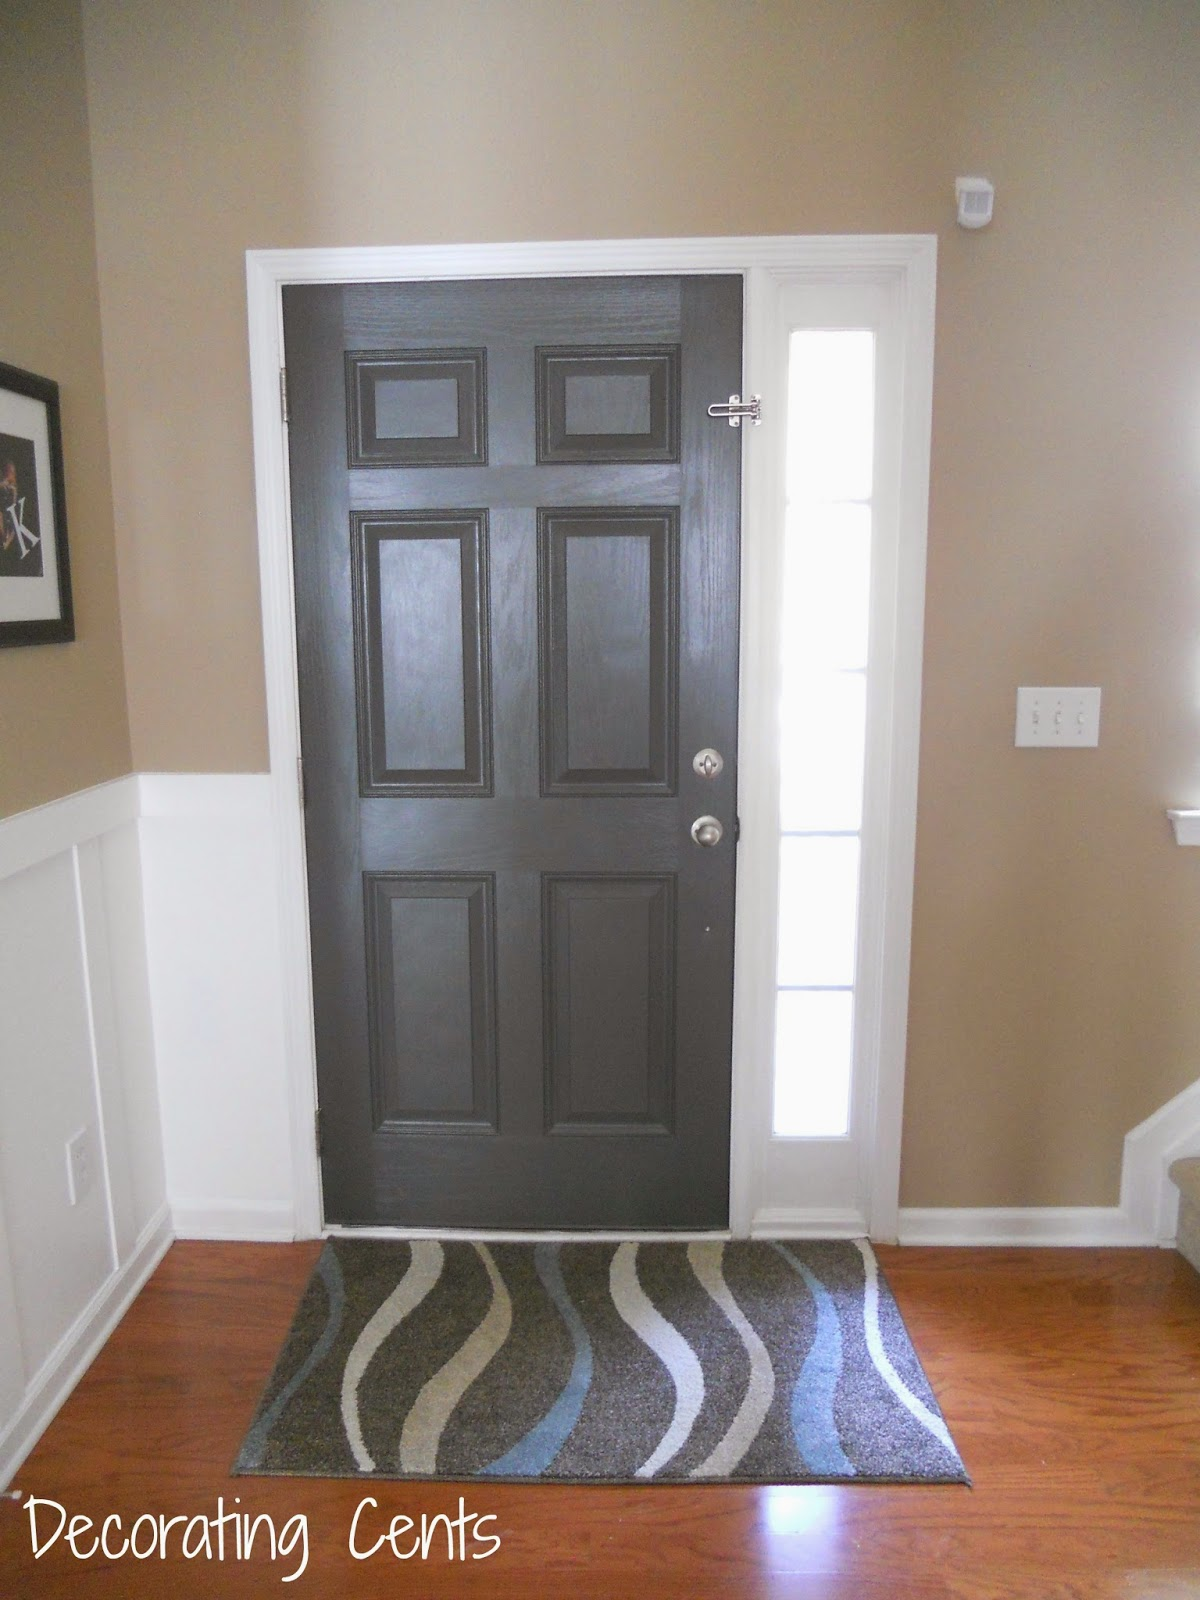 Decorating Cents: Gray Front Door